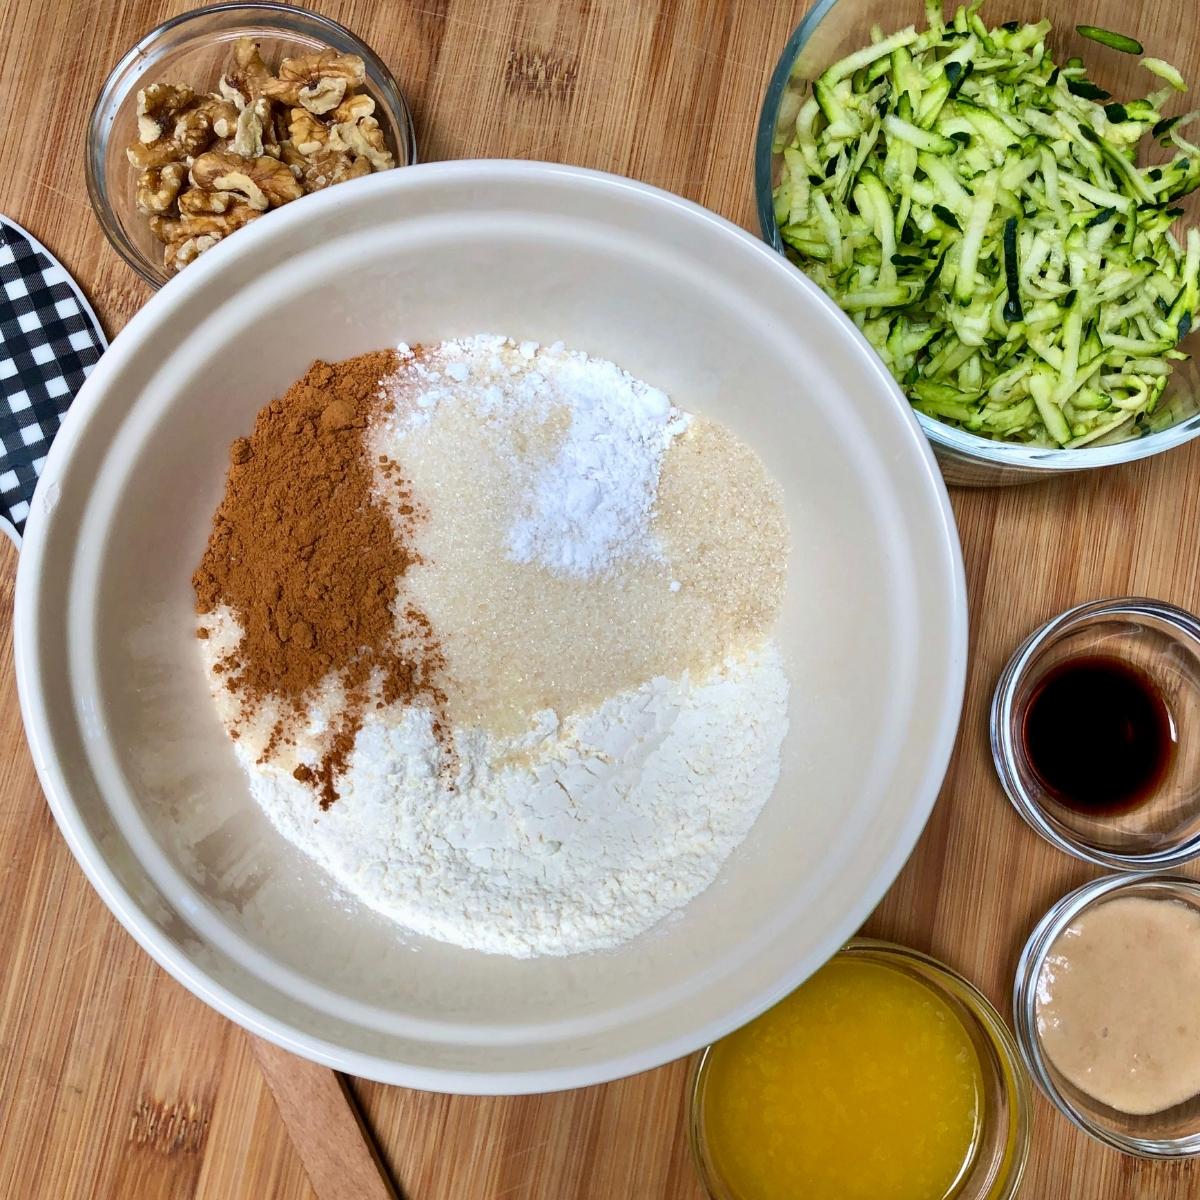 Dry ingredients in bowl for vegan zucchini bread.